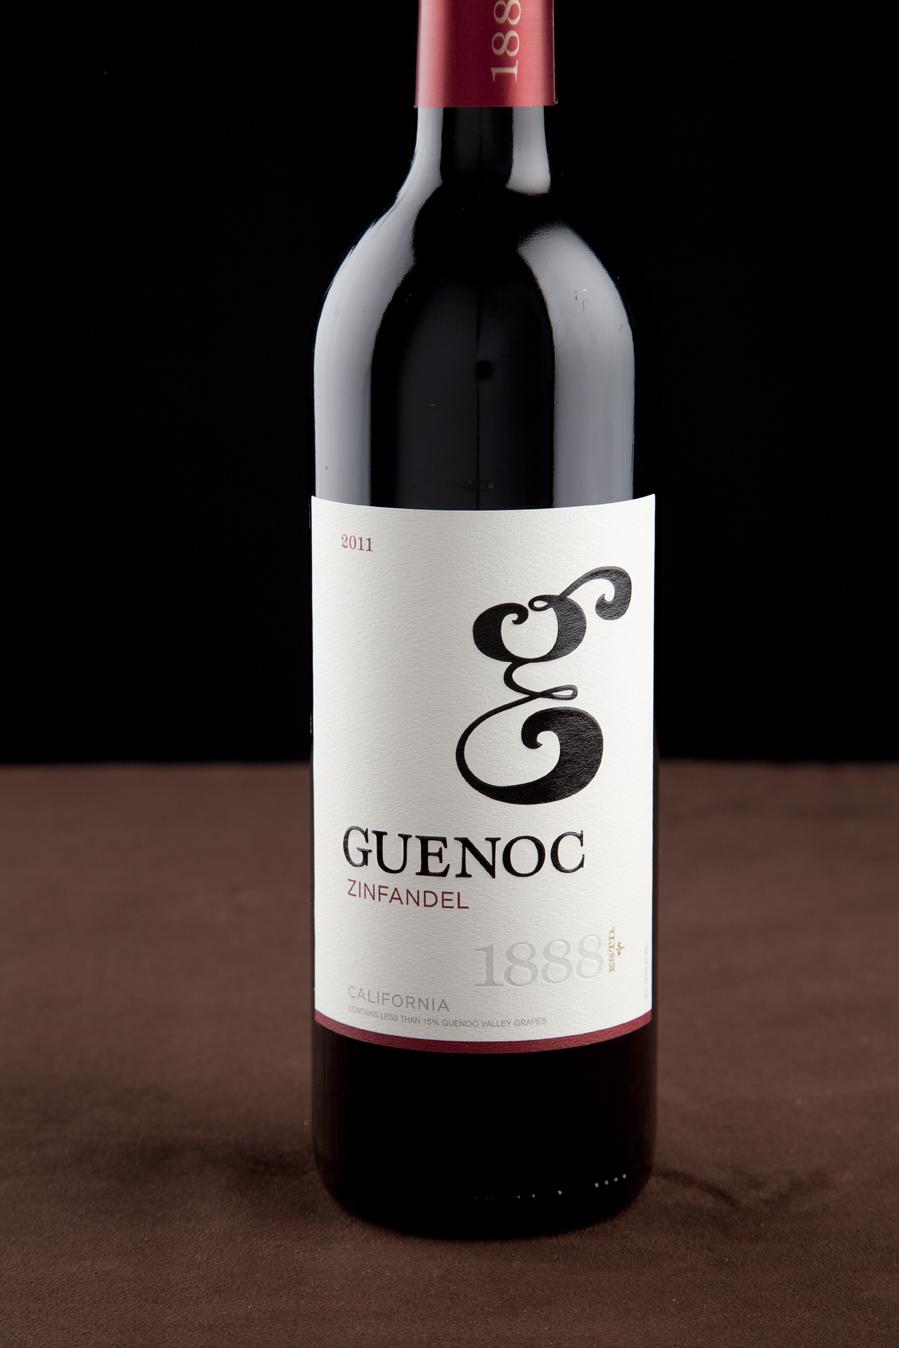 Guenoc g